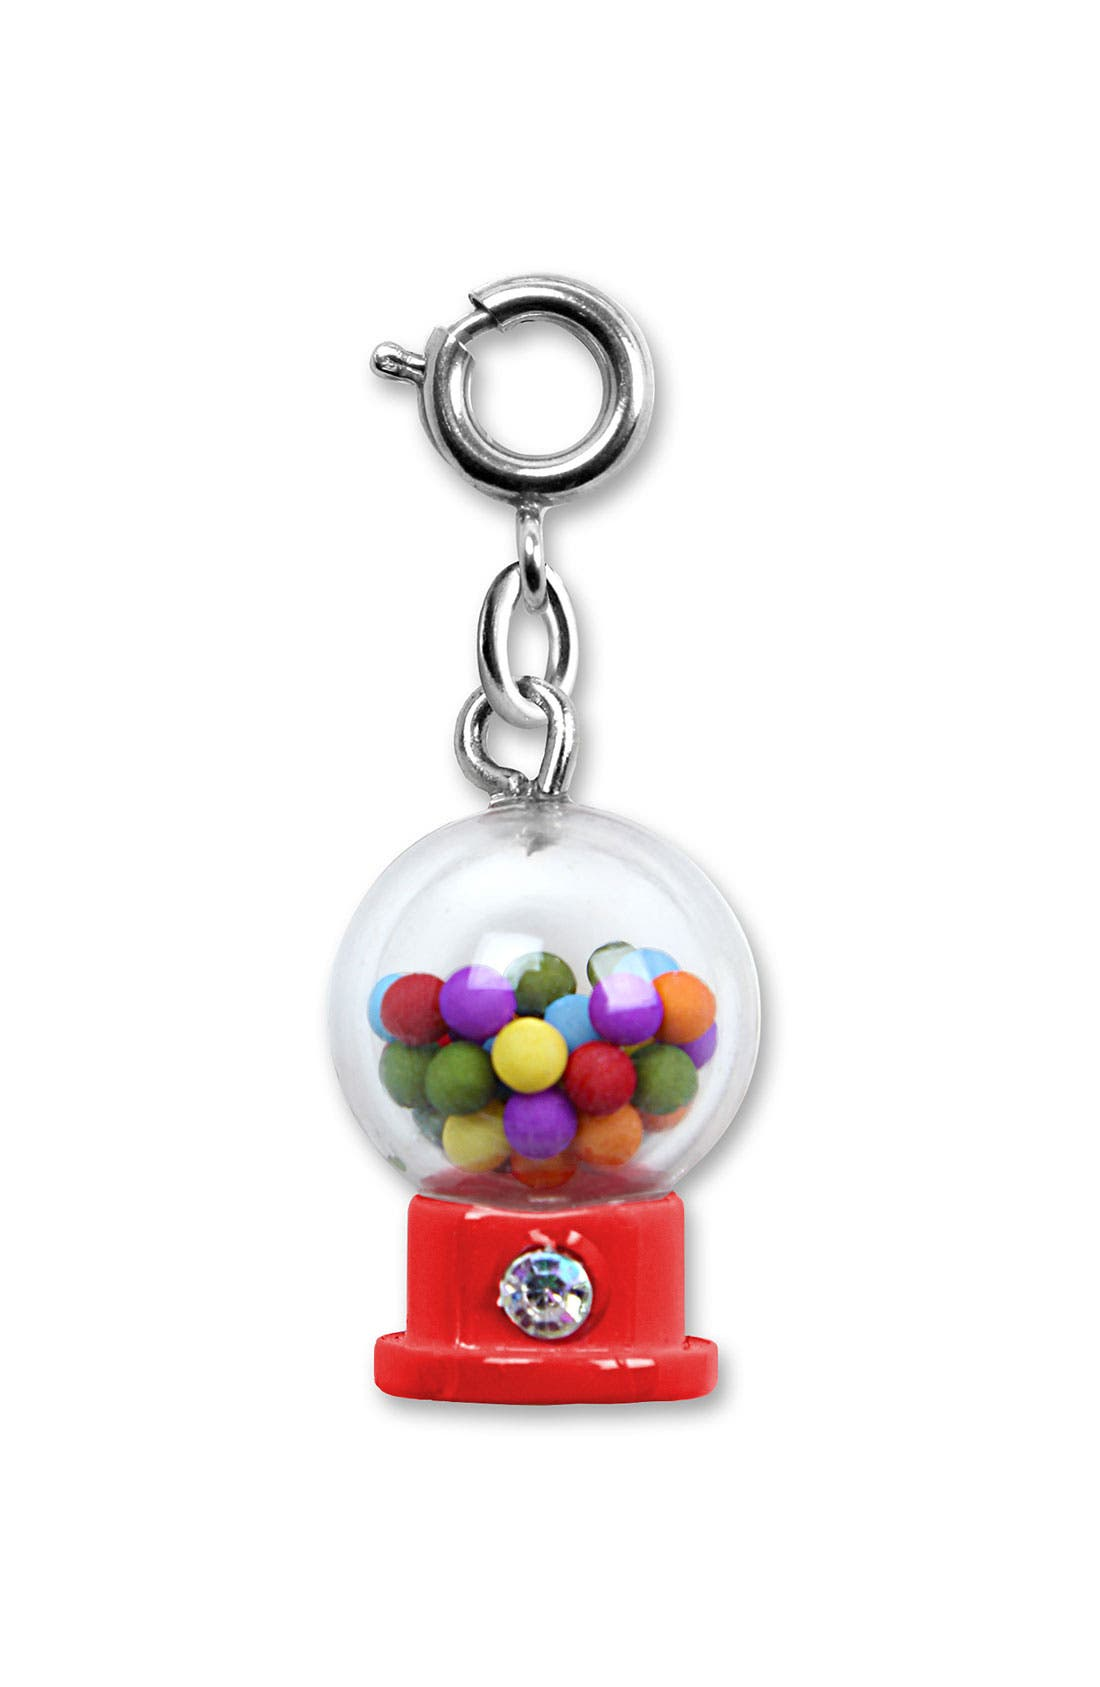 Alternate Image 1 Selected - CHARM IT!® 'Gumball Machine' Charm (Girls)